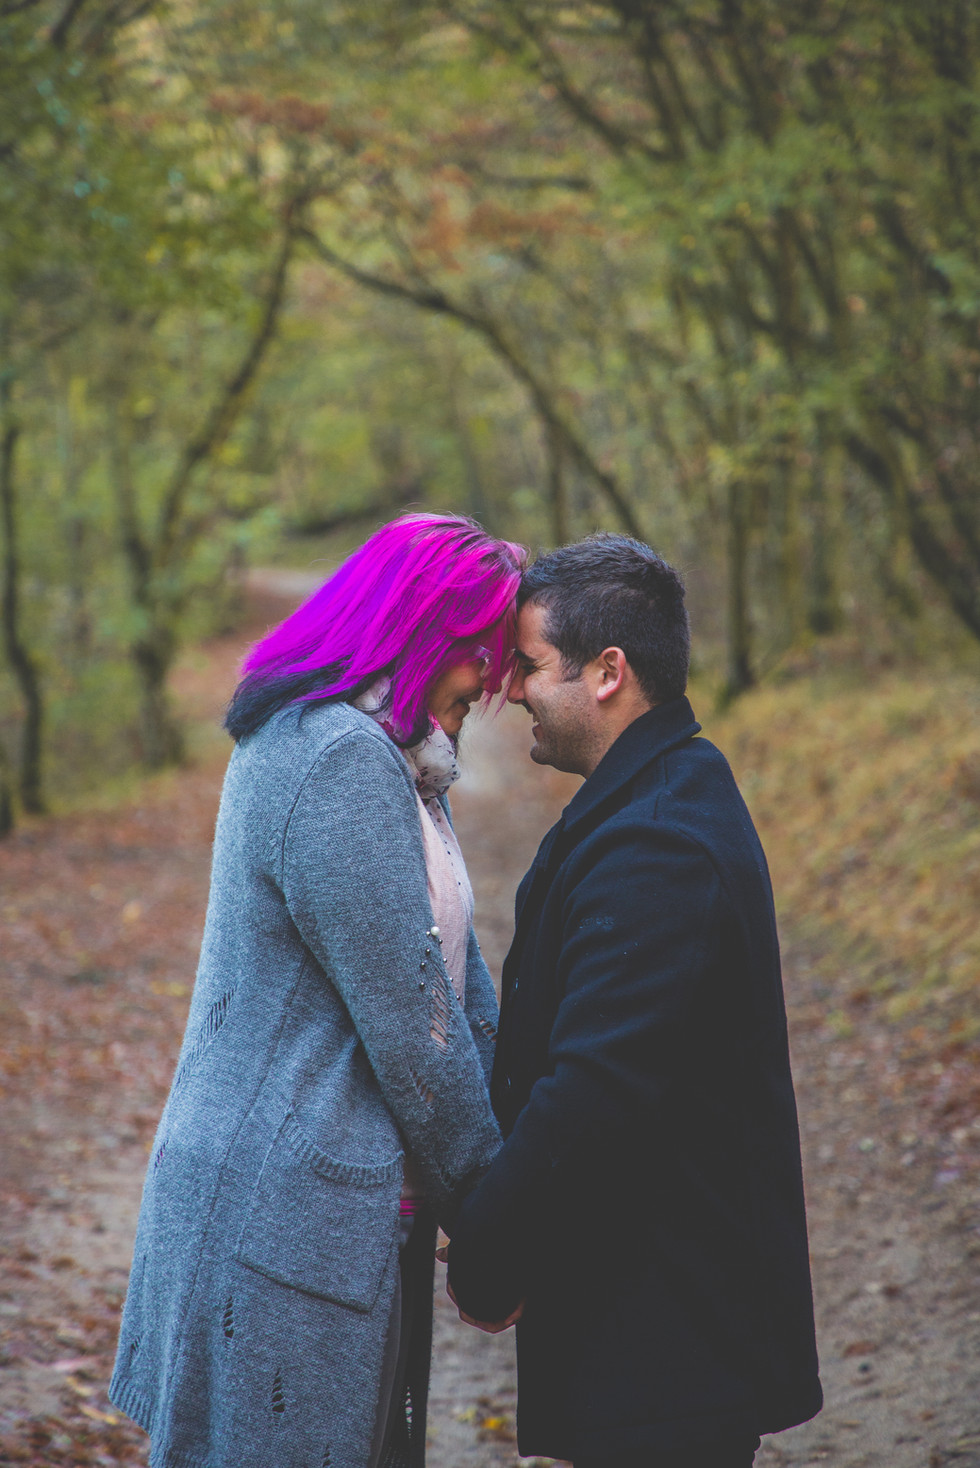 photographe-couple-engagement-lifestyle-valence-drome-HD-3.jpg